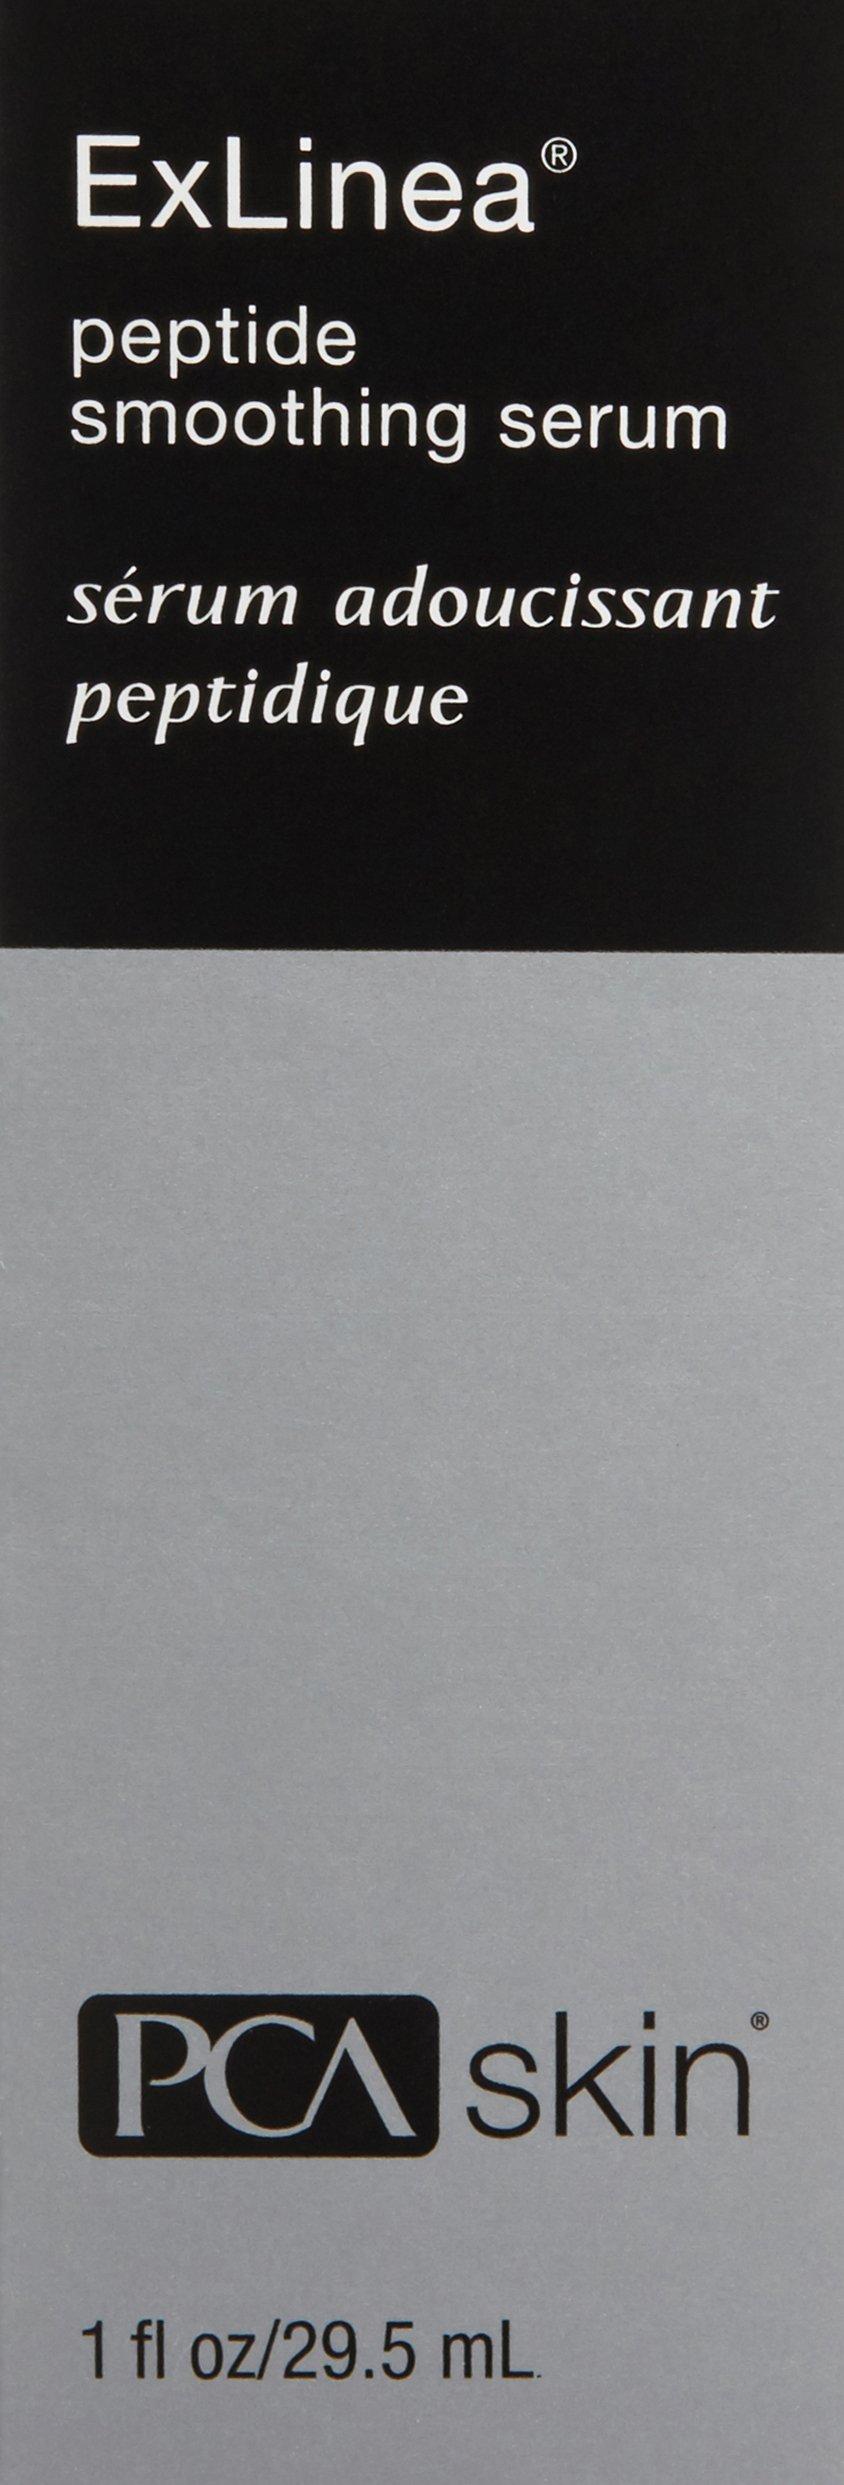 PCA SKIN Exlinea Peptide Smoothing Serum, 1 fl. oz. by PCA SKIN (Image #3)